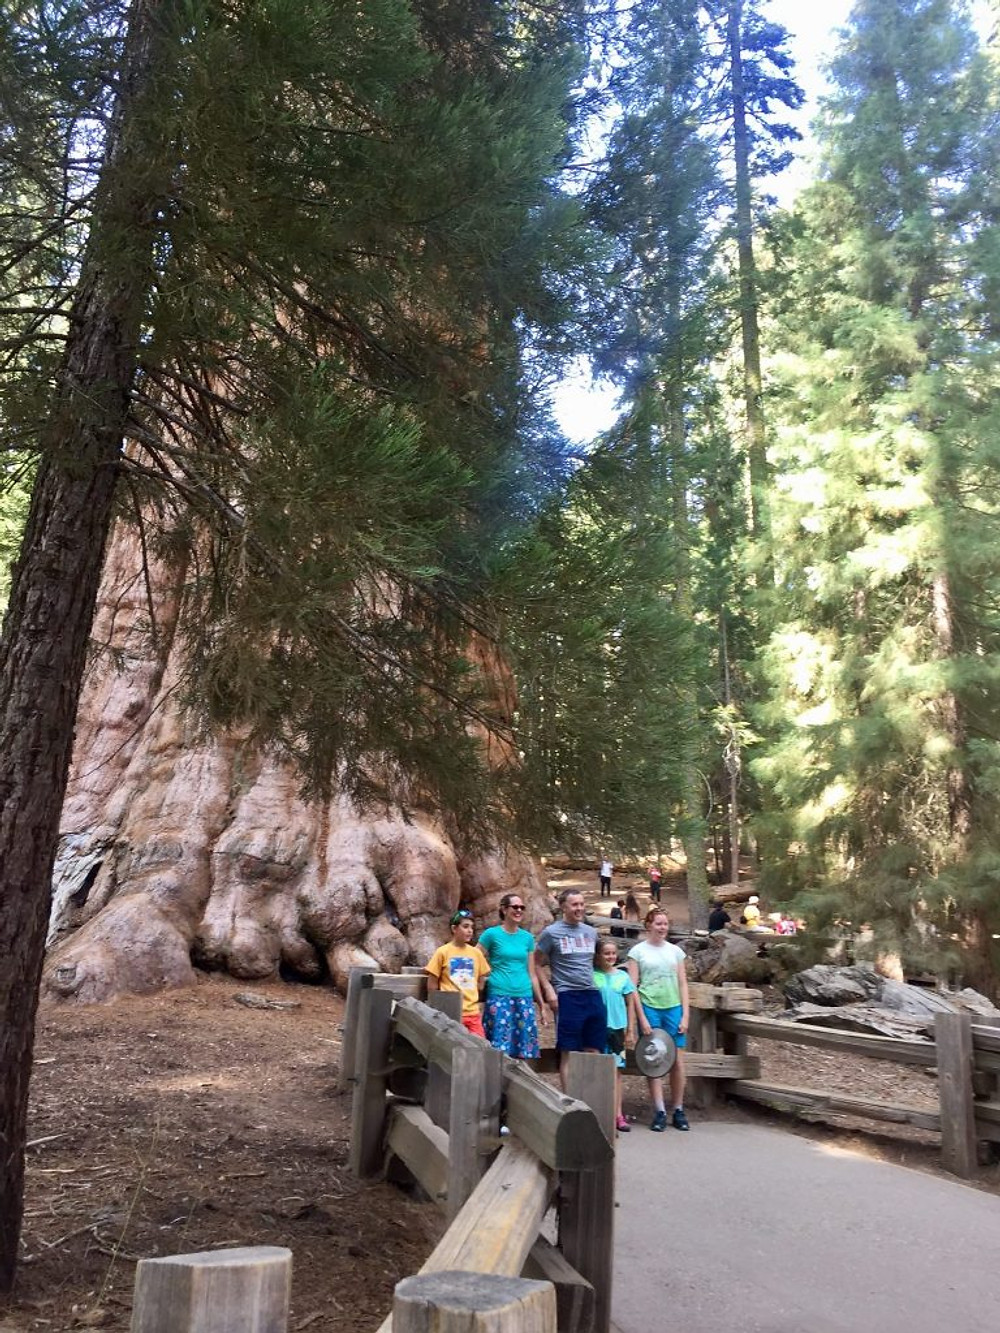 sherman tree sequoia national park